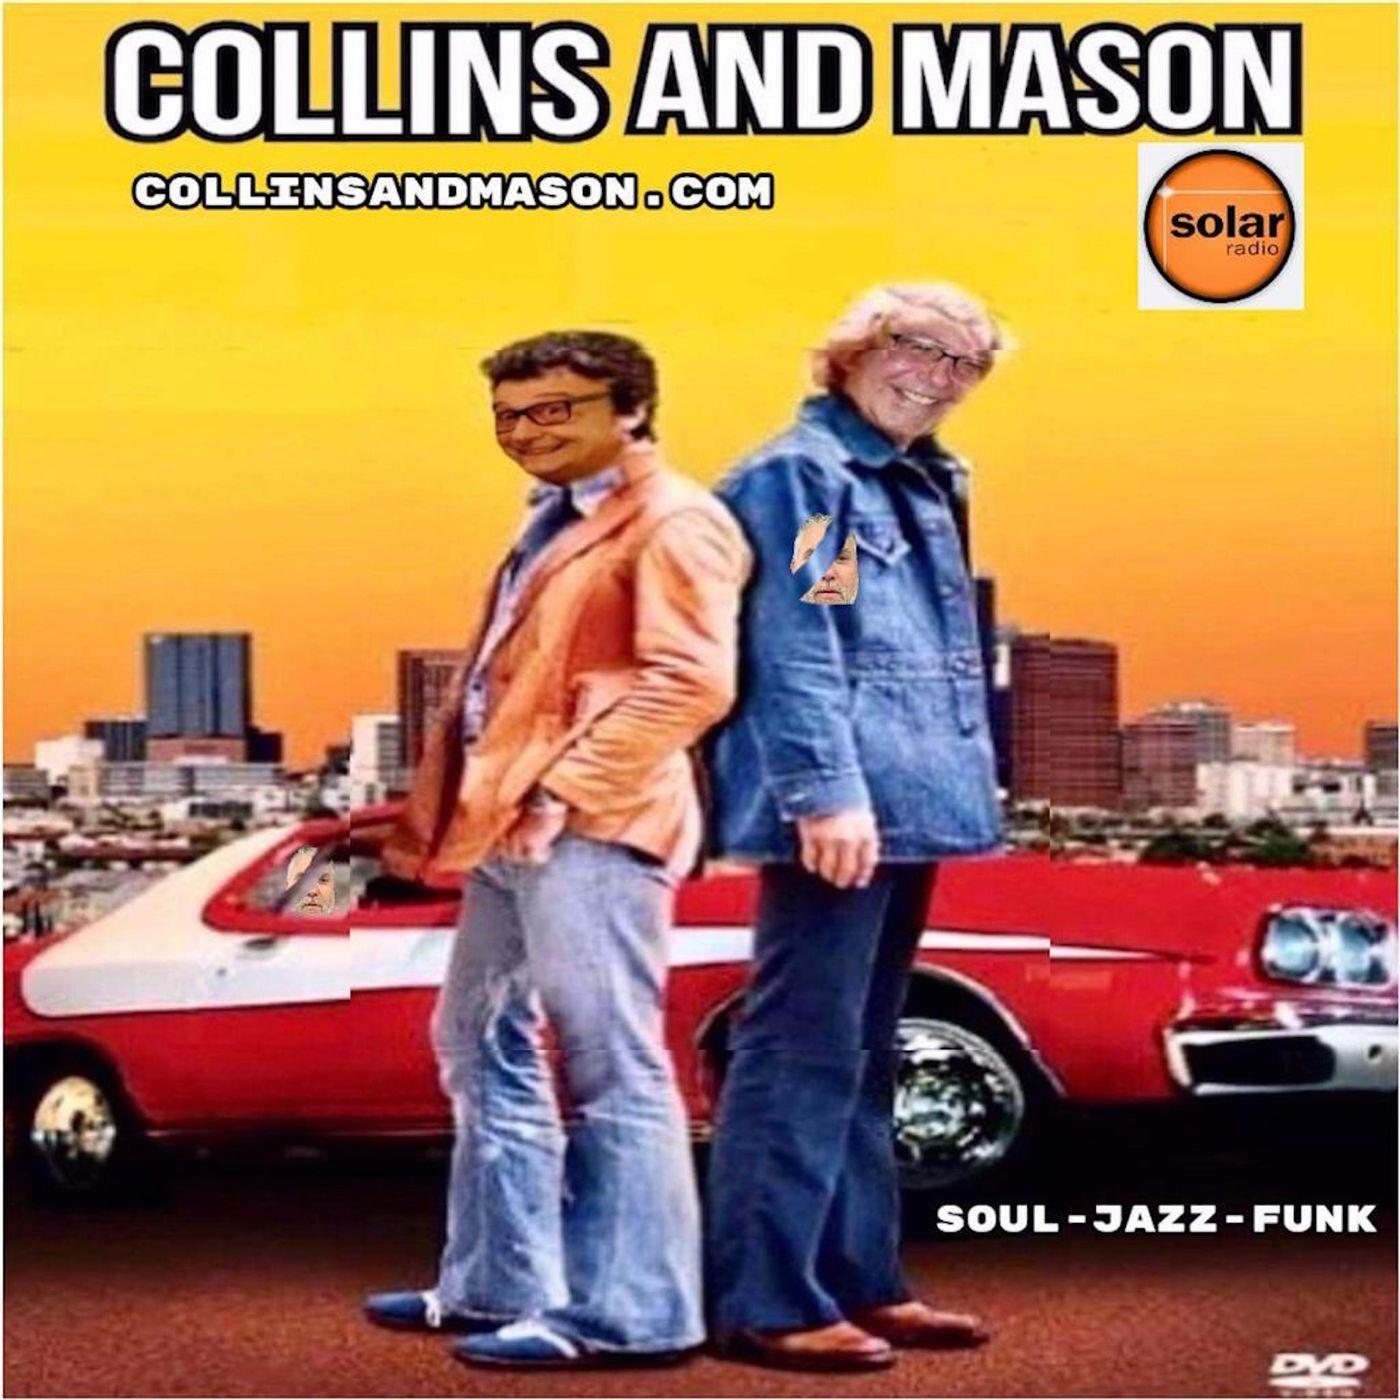 Collins & Mason 13-09-21 Chat n Choonz